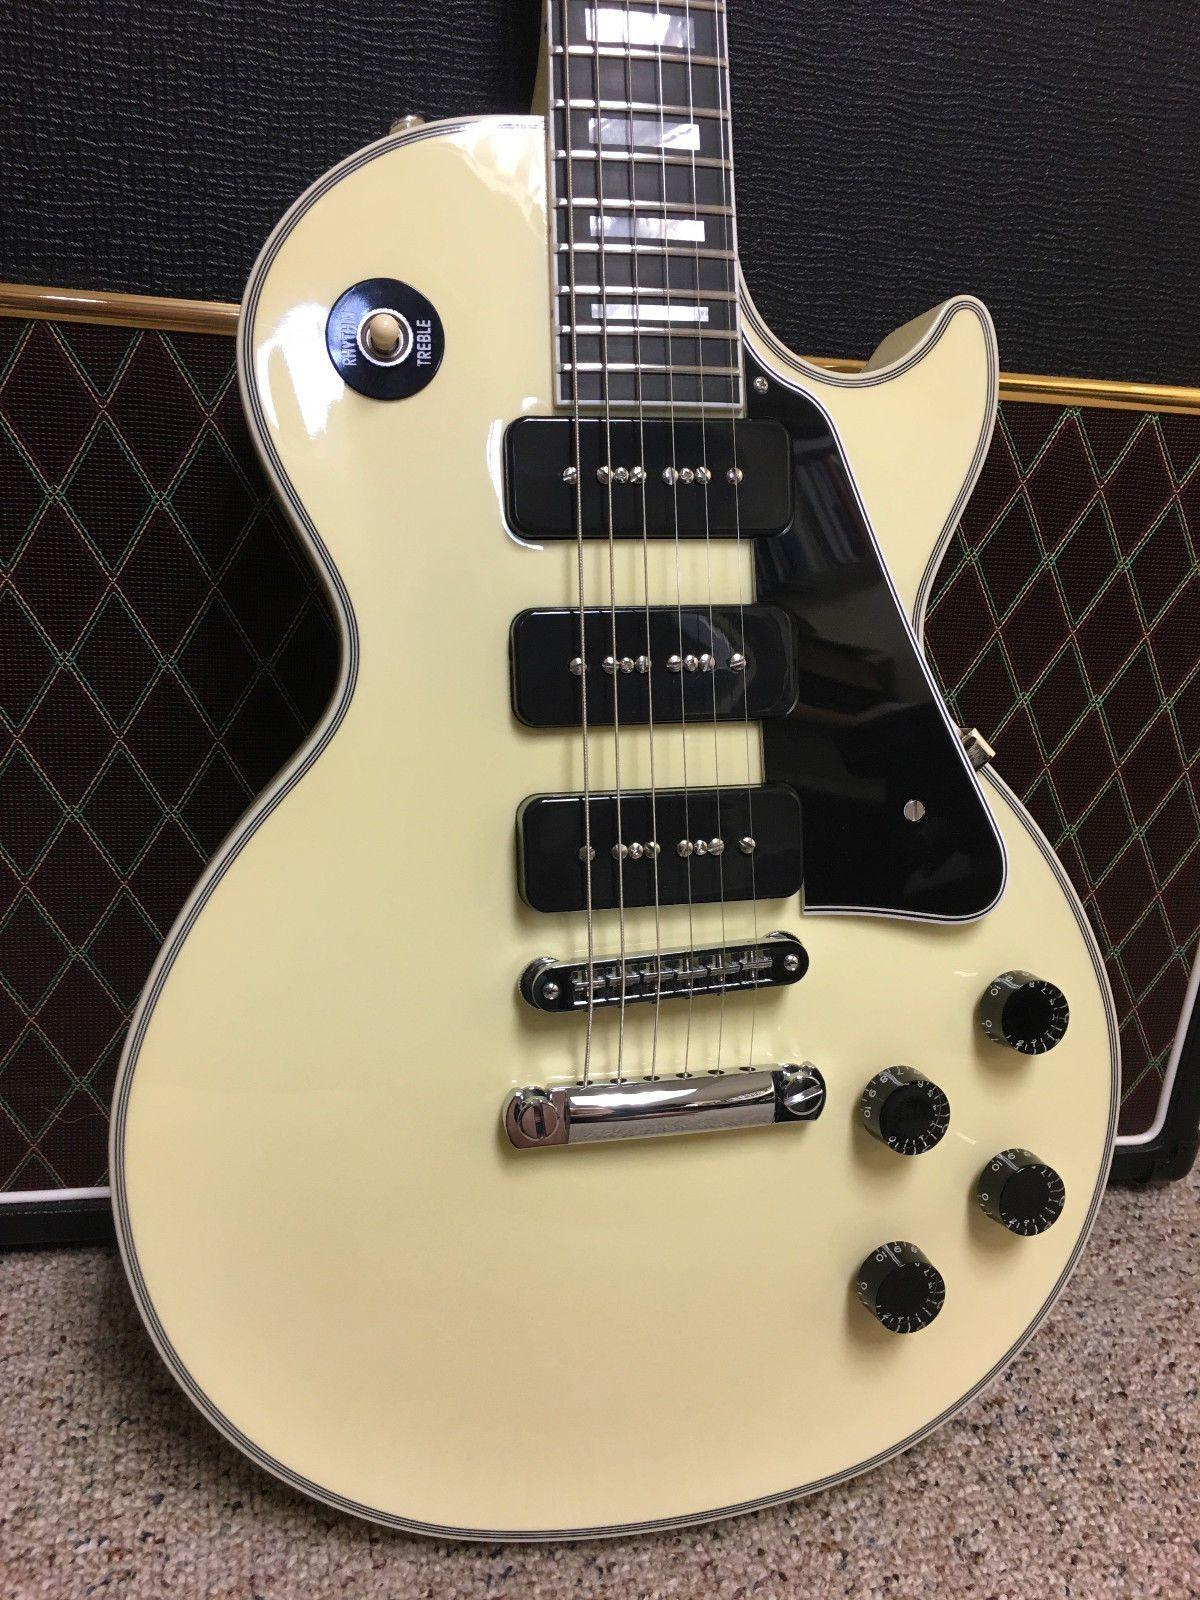 2018 Custom 3 Black P90 P 90 Pickups White Electric Guitar Ebony